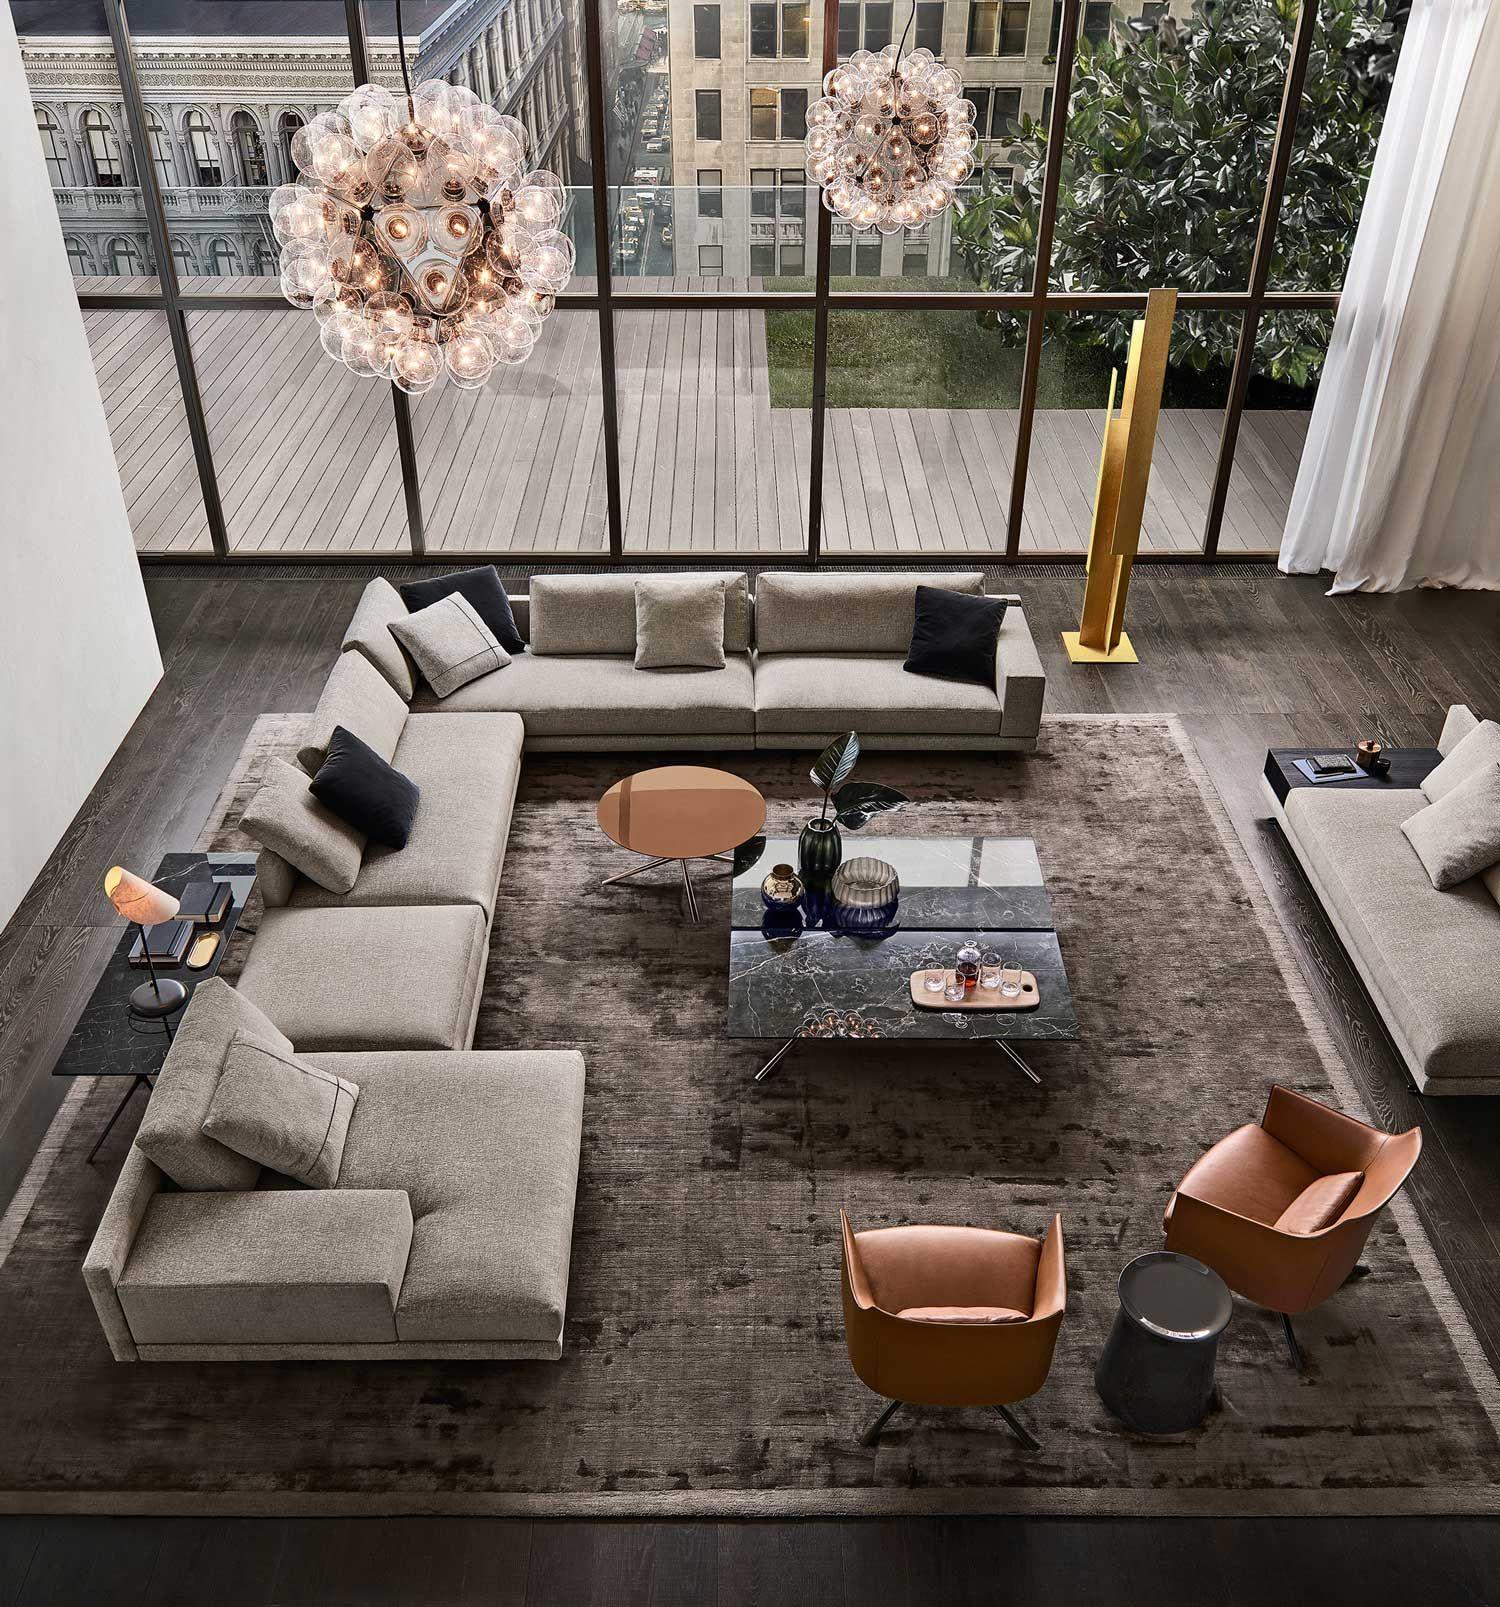 Poliform Mondrian Sofajeanmarie Massaud  Mondrian Living Brilliant Contemporary Modern Living Room Inspiration